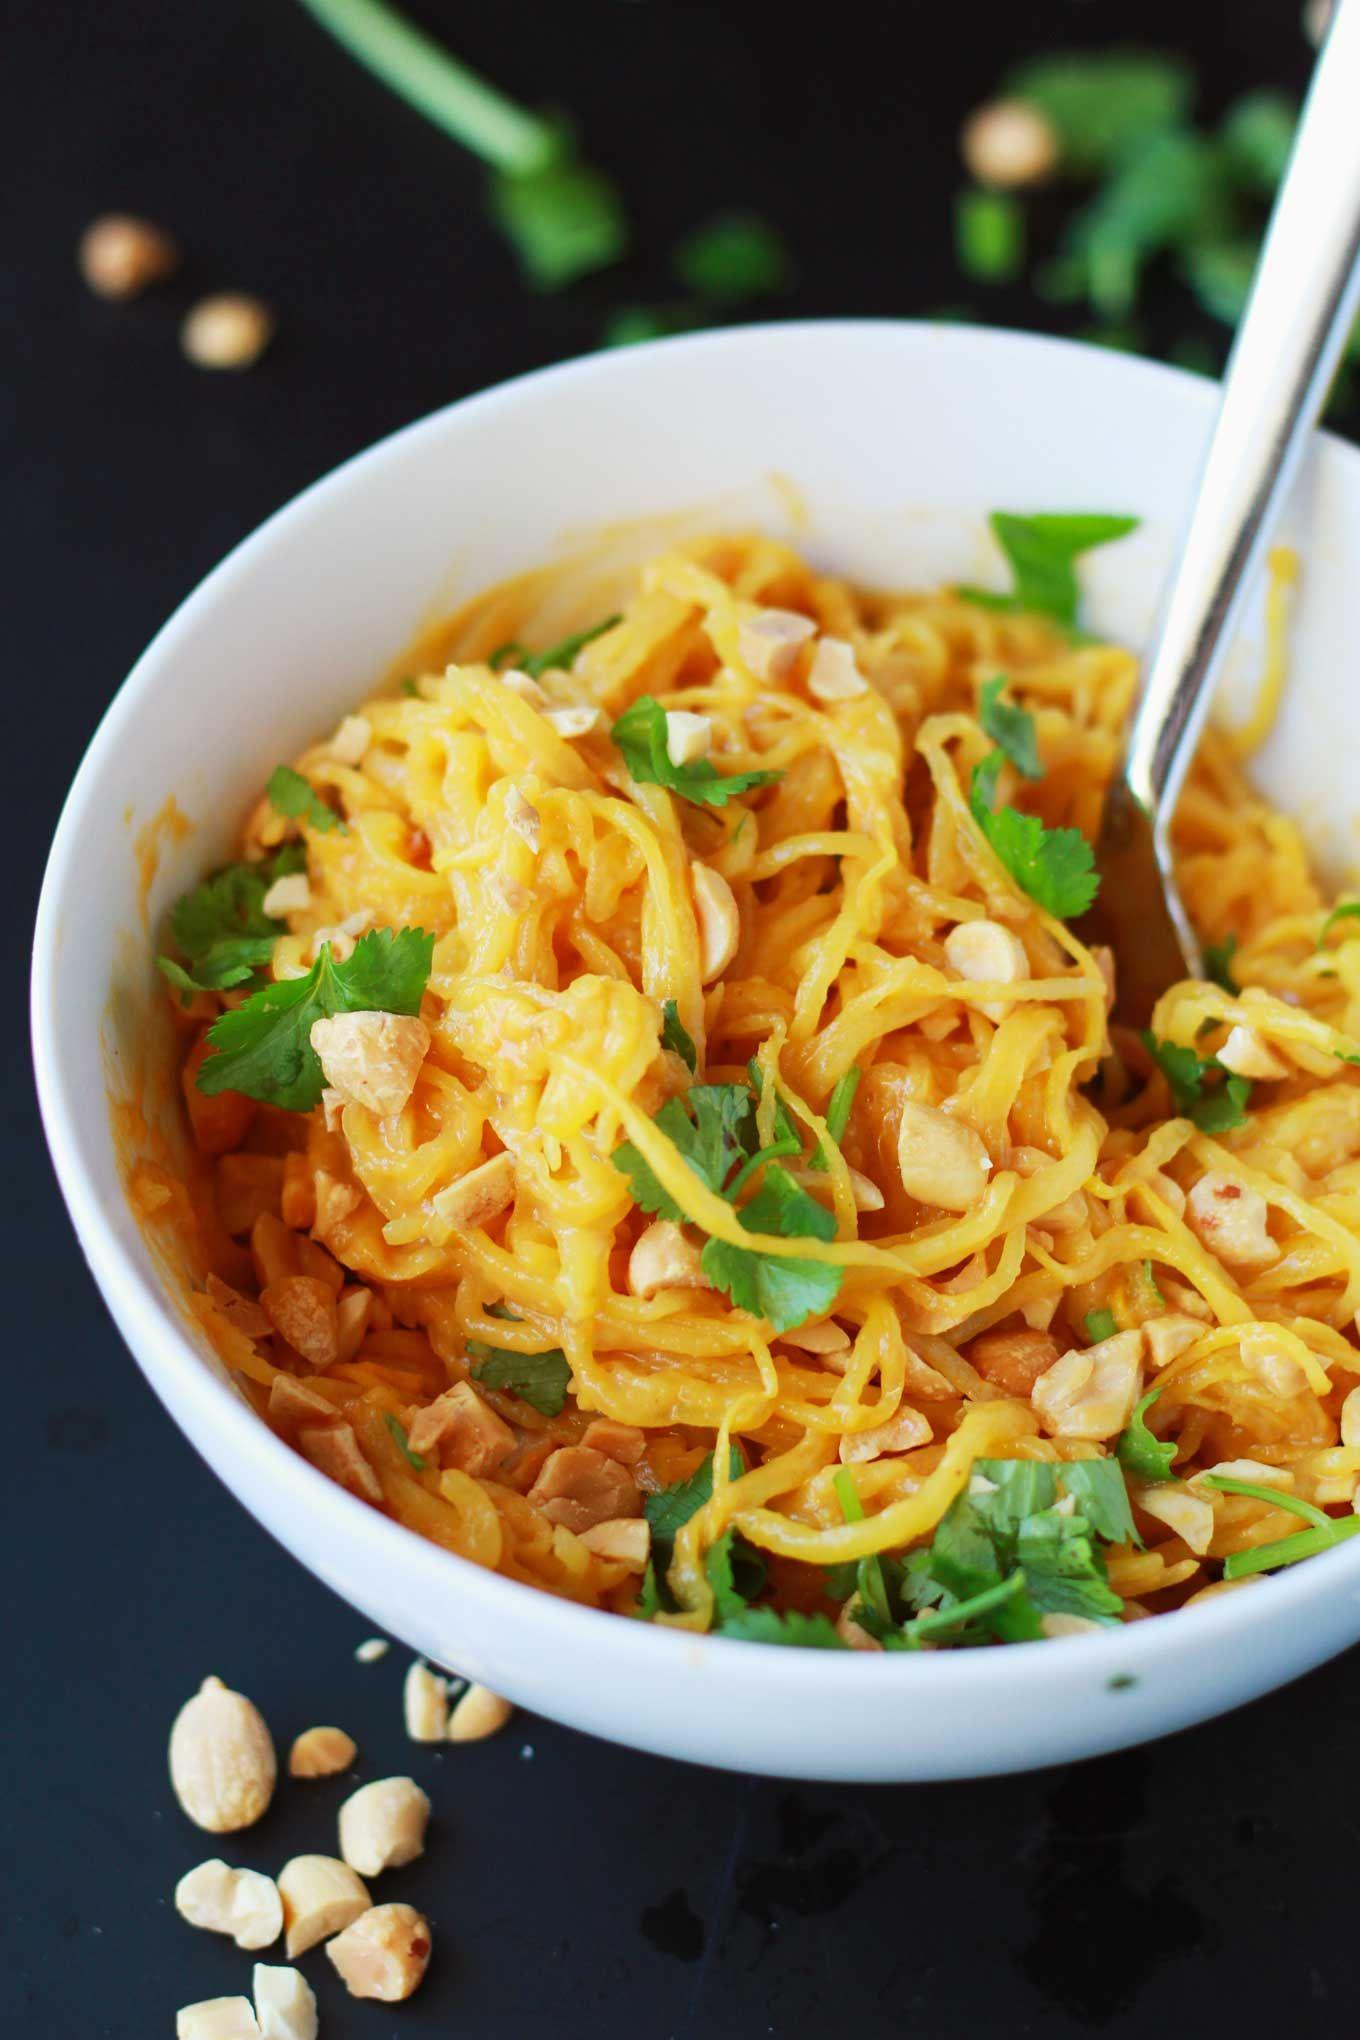 Spaghetti Squash Peanut Noodles